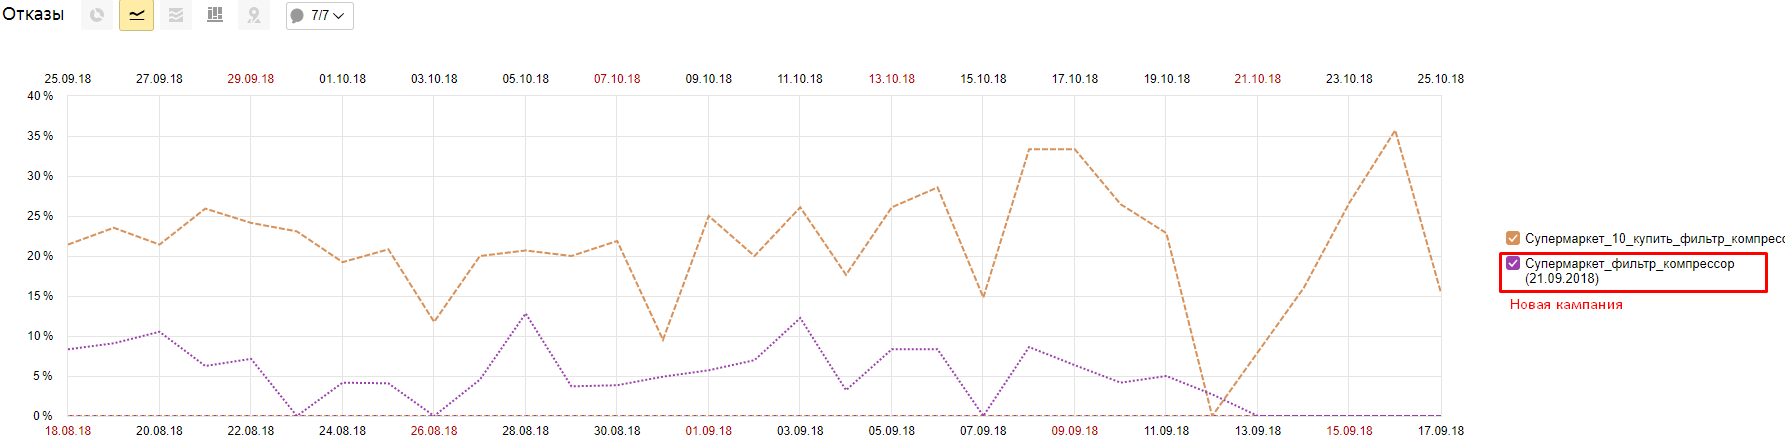 На графике показано снижение % отказов после оптимизации кампании